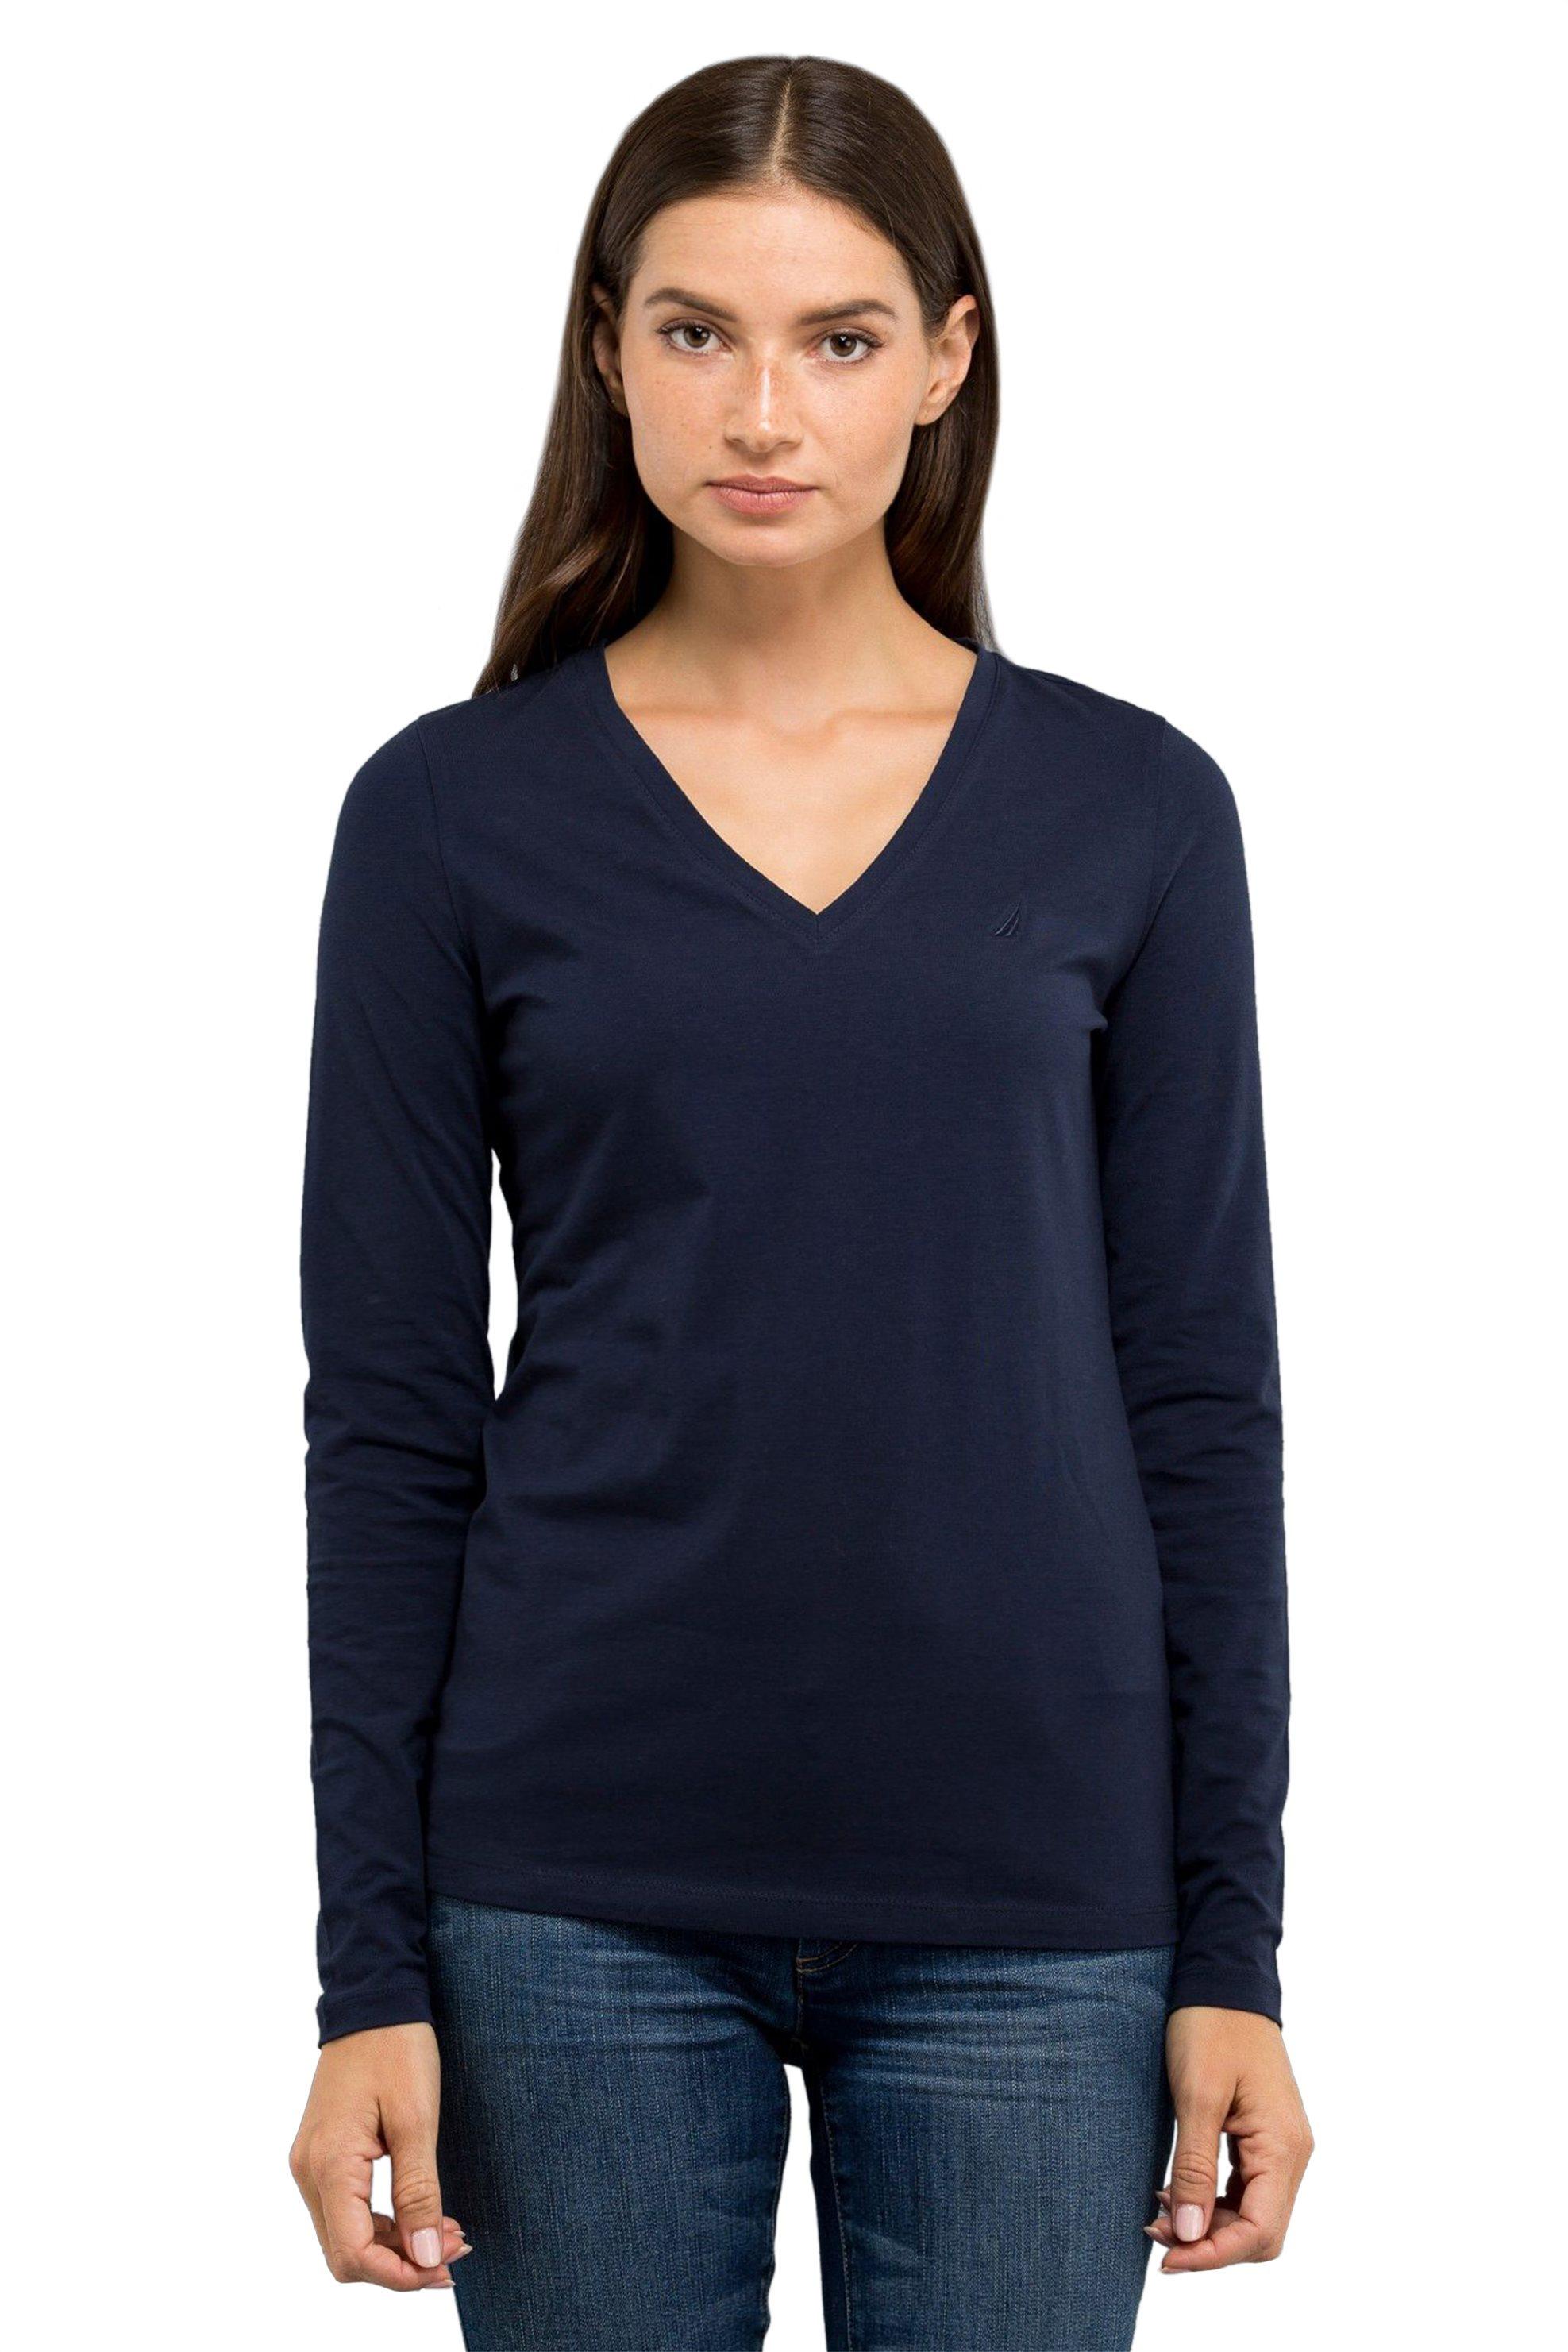 65aeec5769a0 Nautica Γυναικεία Basic Μπλούζα Με ...